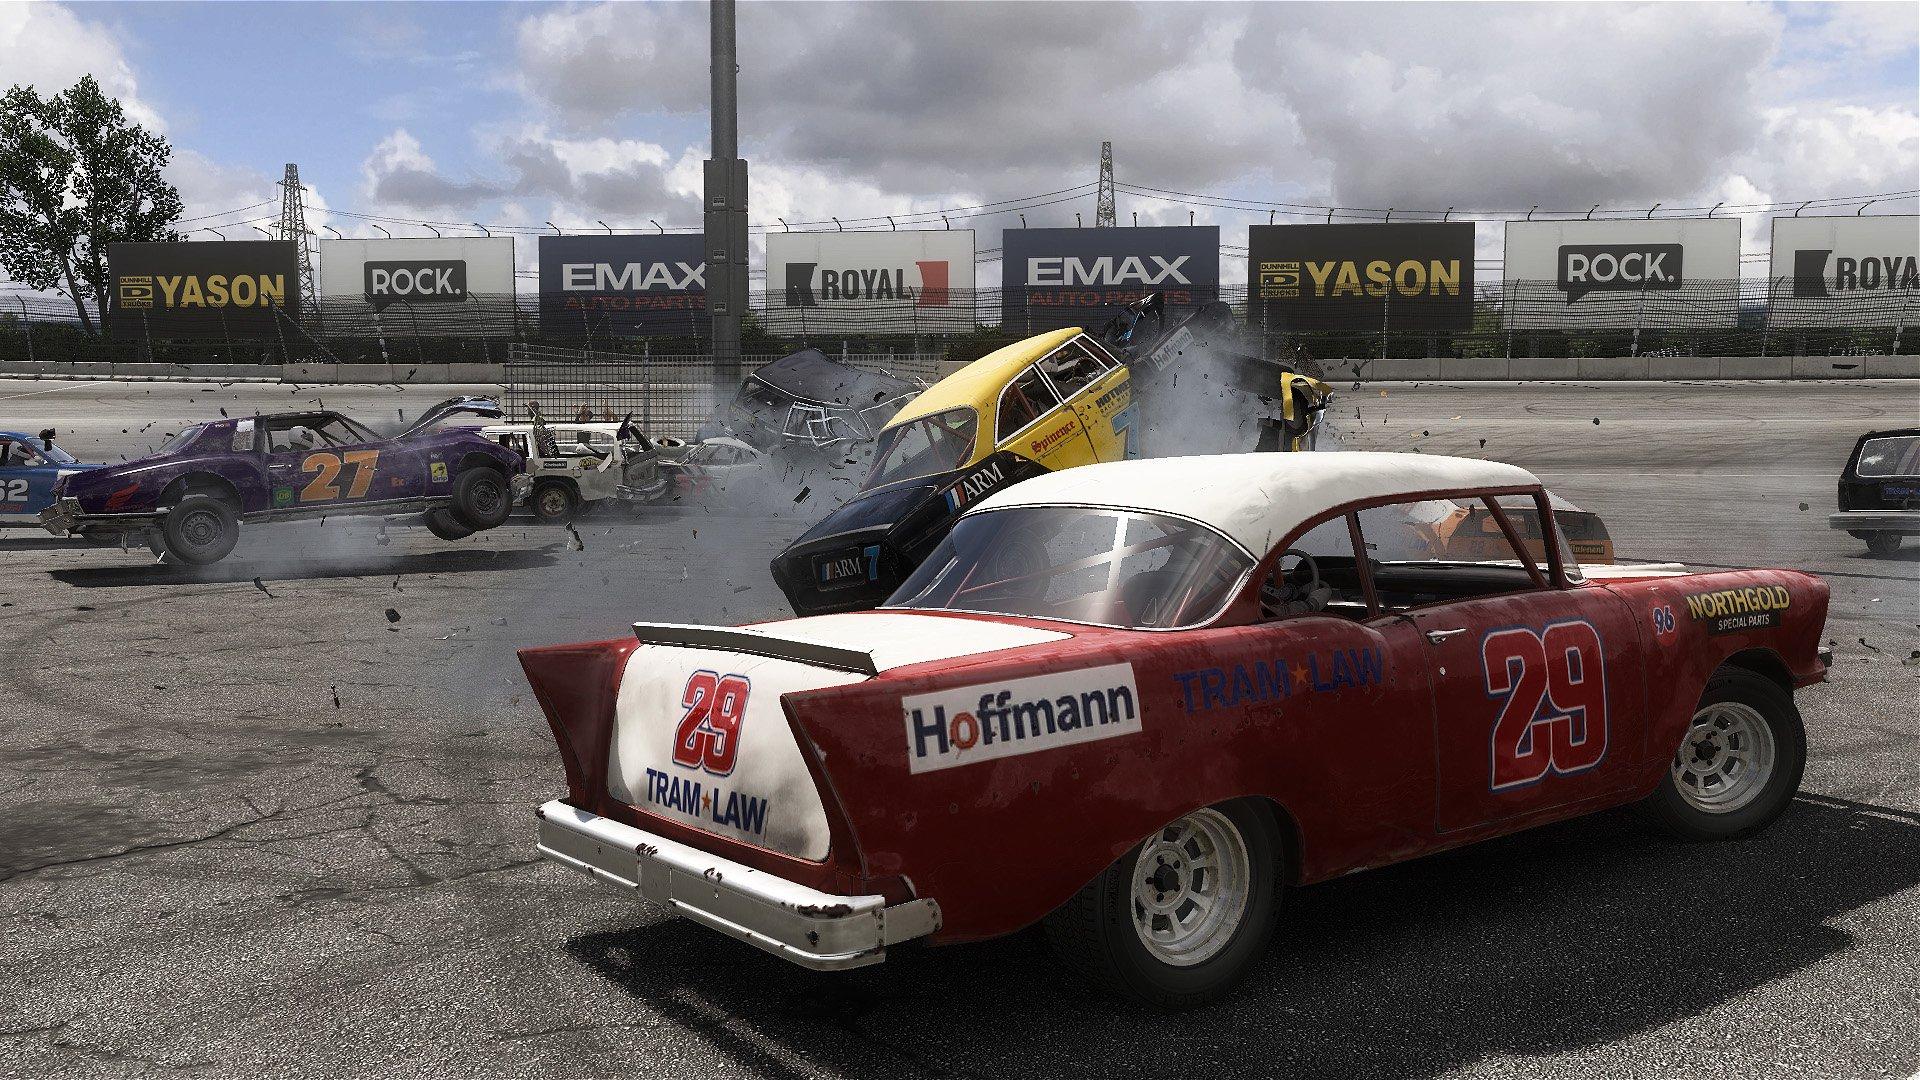 Next Car Game Wreckfest 6